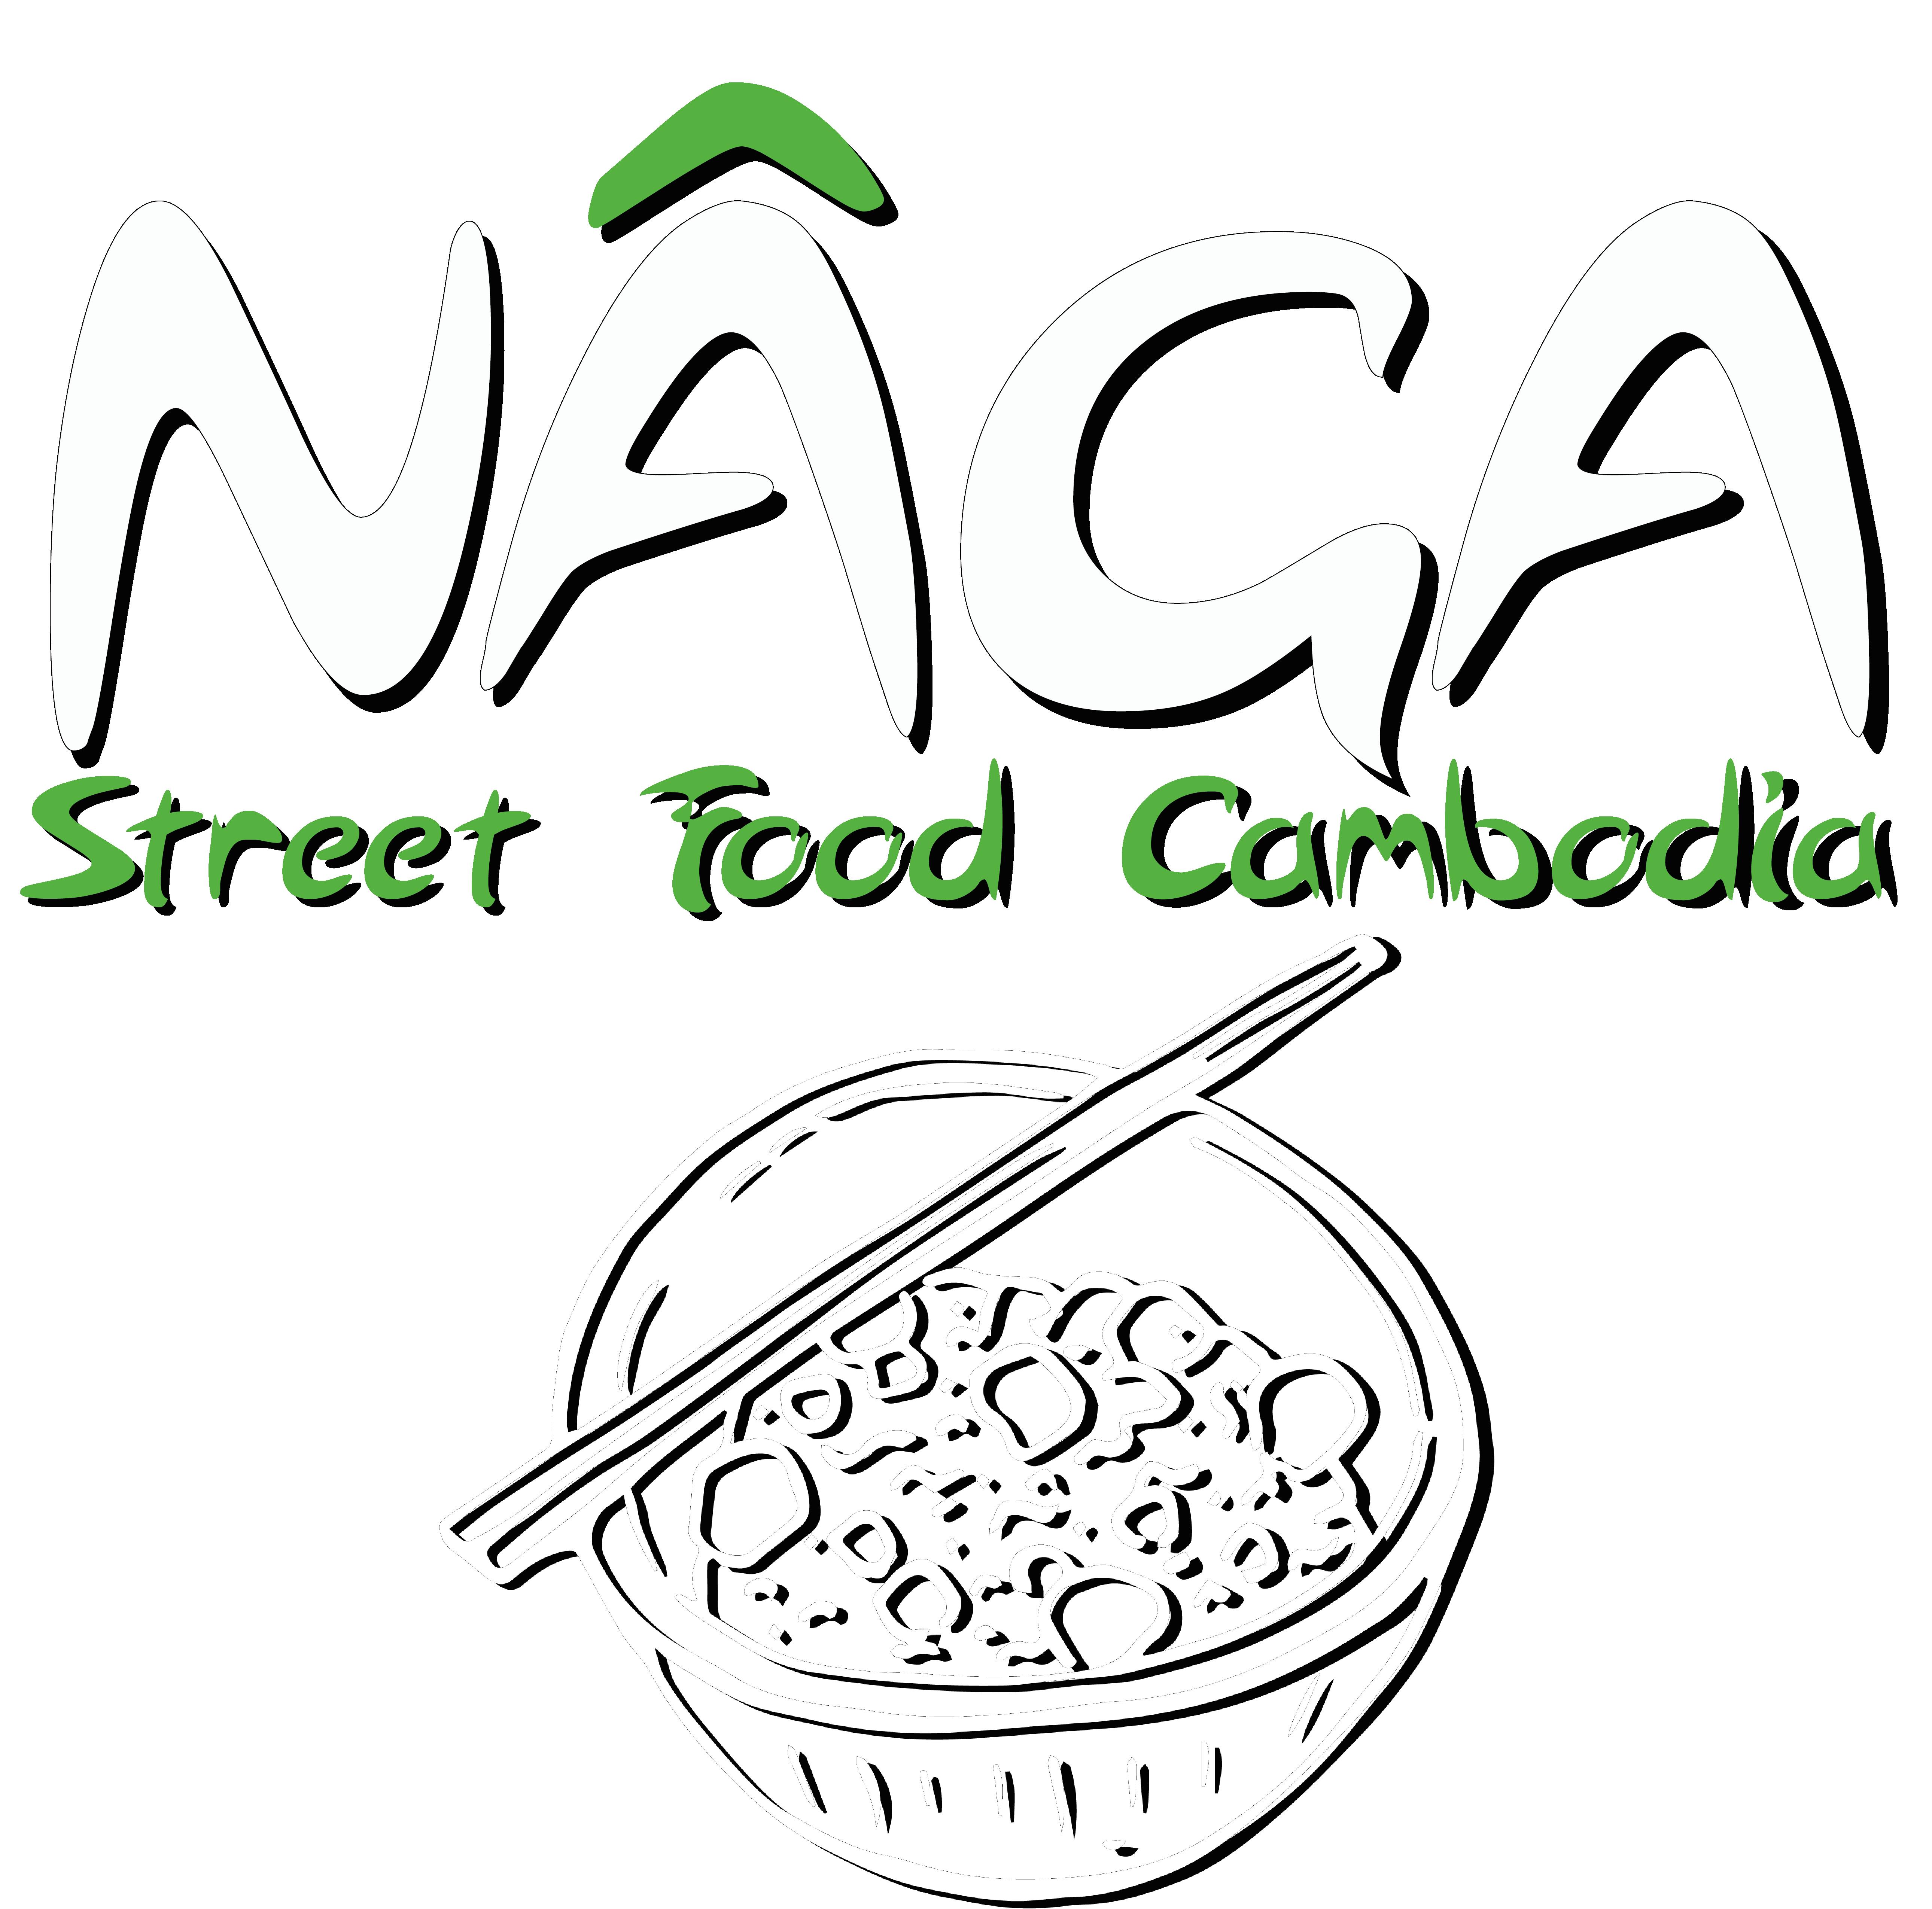 Logo Nâga Sophia combodia street food